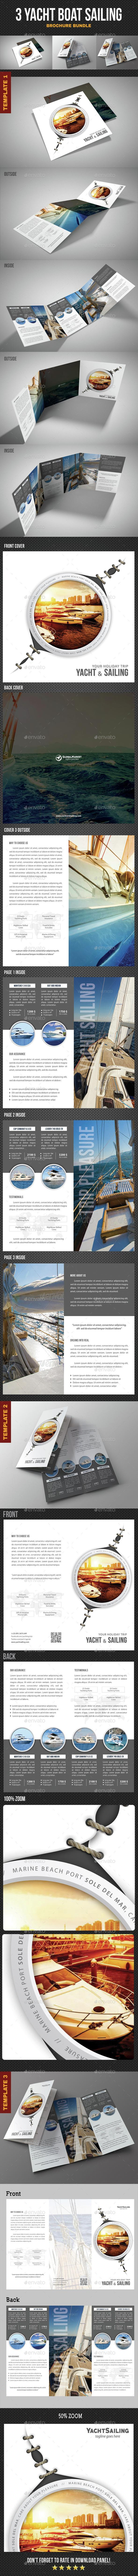 3 Yacht Boat Sailing Brochure Bundle - Brochures Print Templates